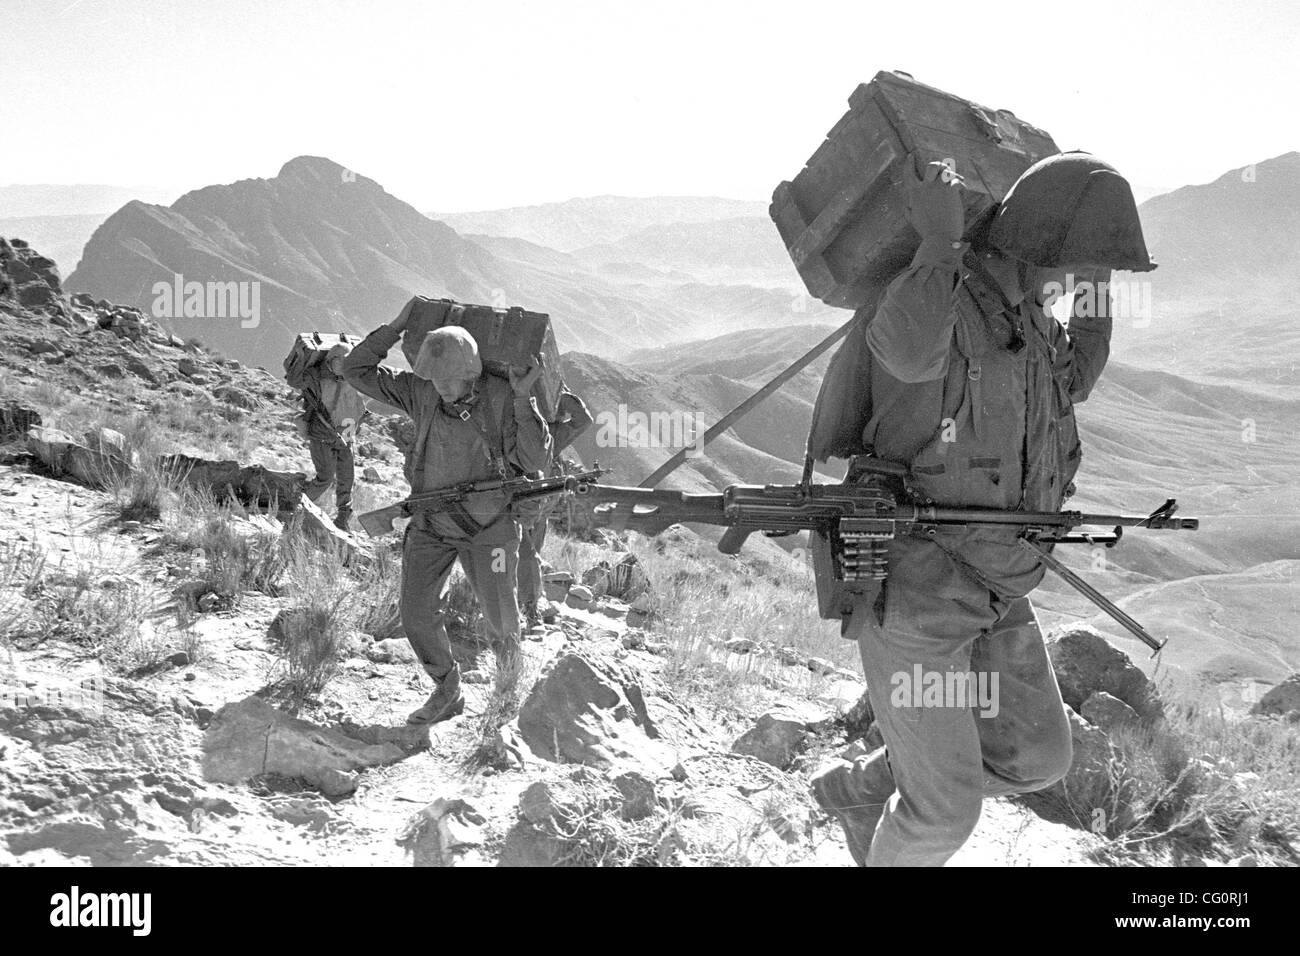 Soviet Afghanistan war - Page 6 Jul-12-2007-kabul-afghanistan-the-soviet-war-in-afghanistan-was-a-CG0RJ1